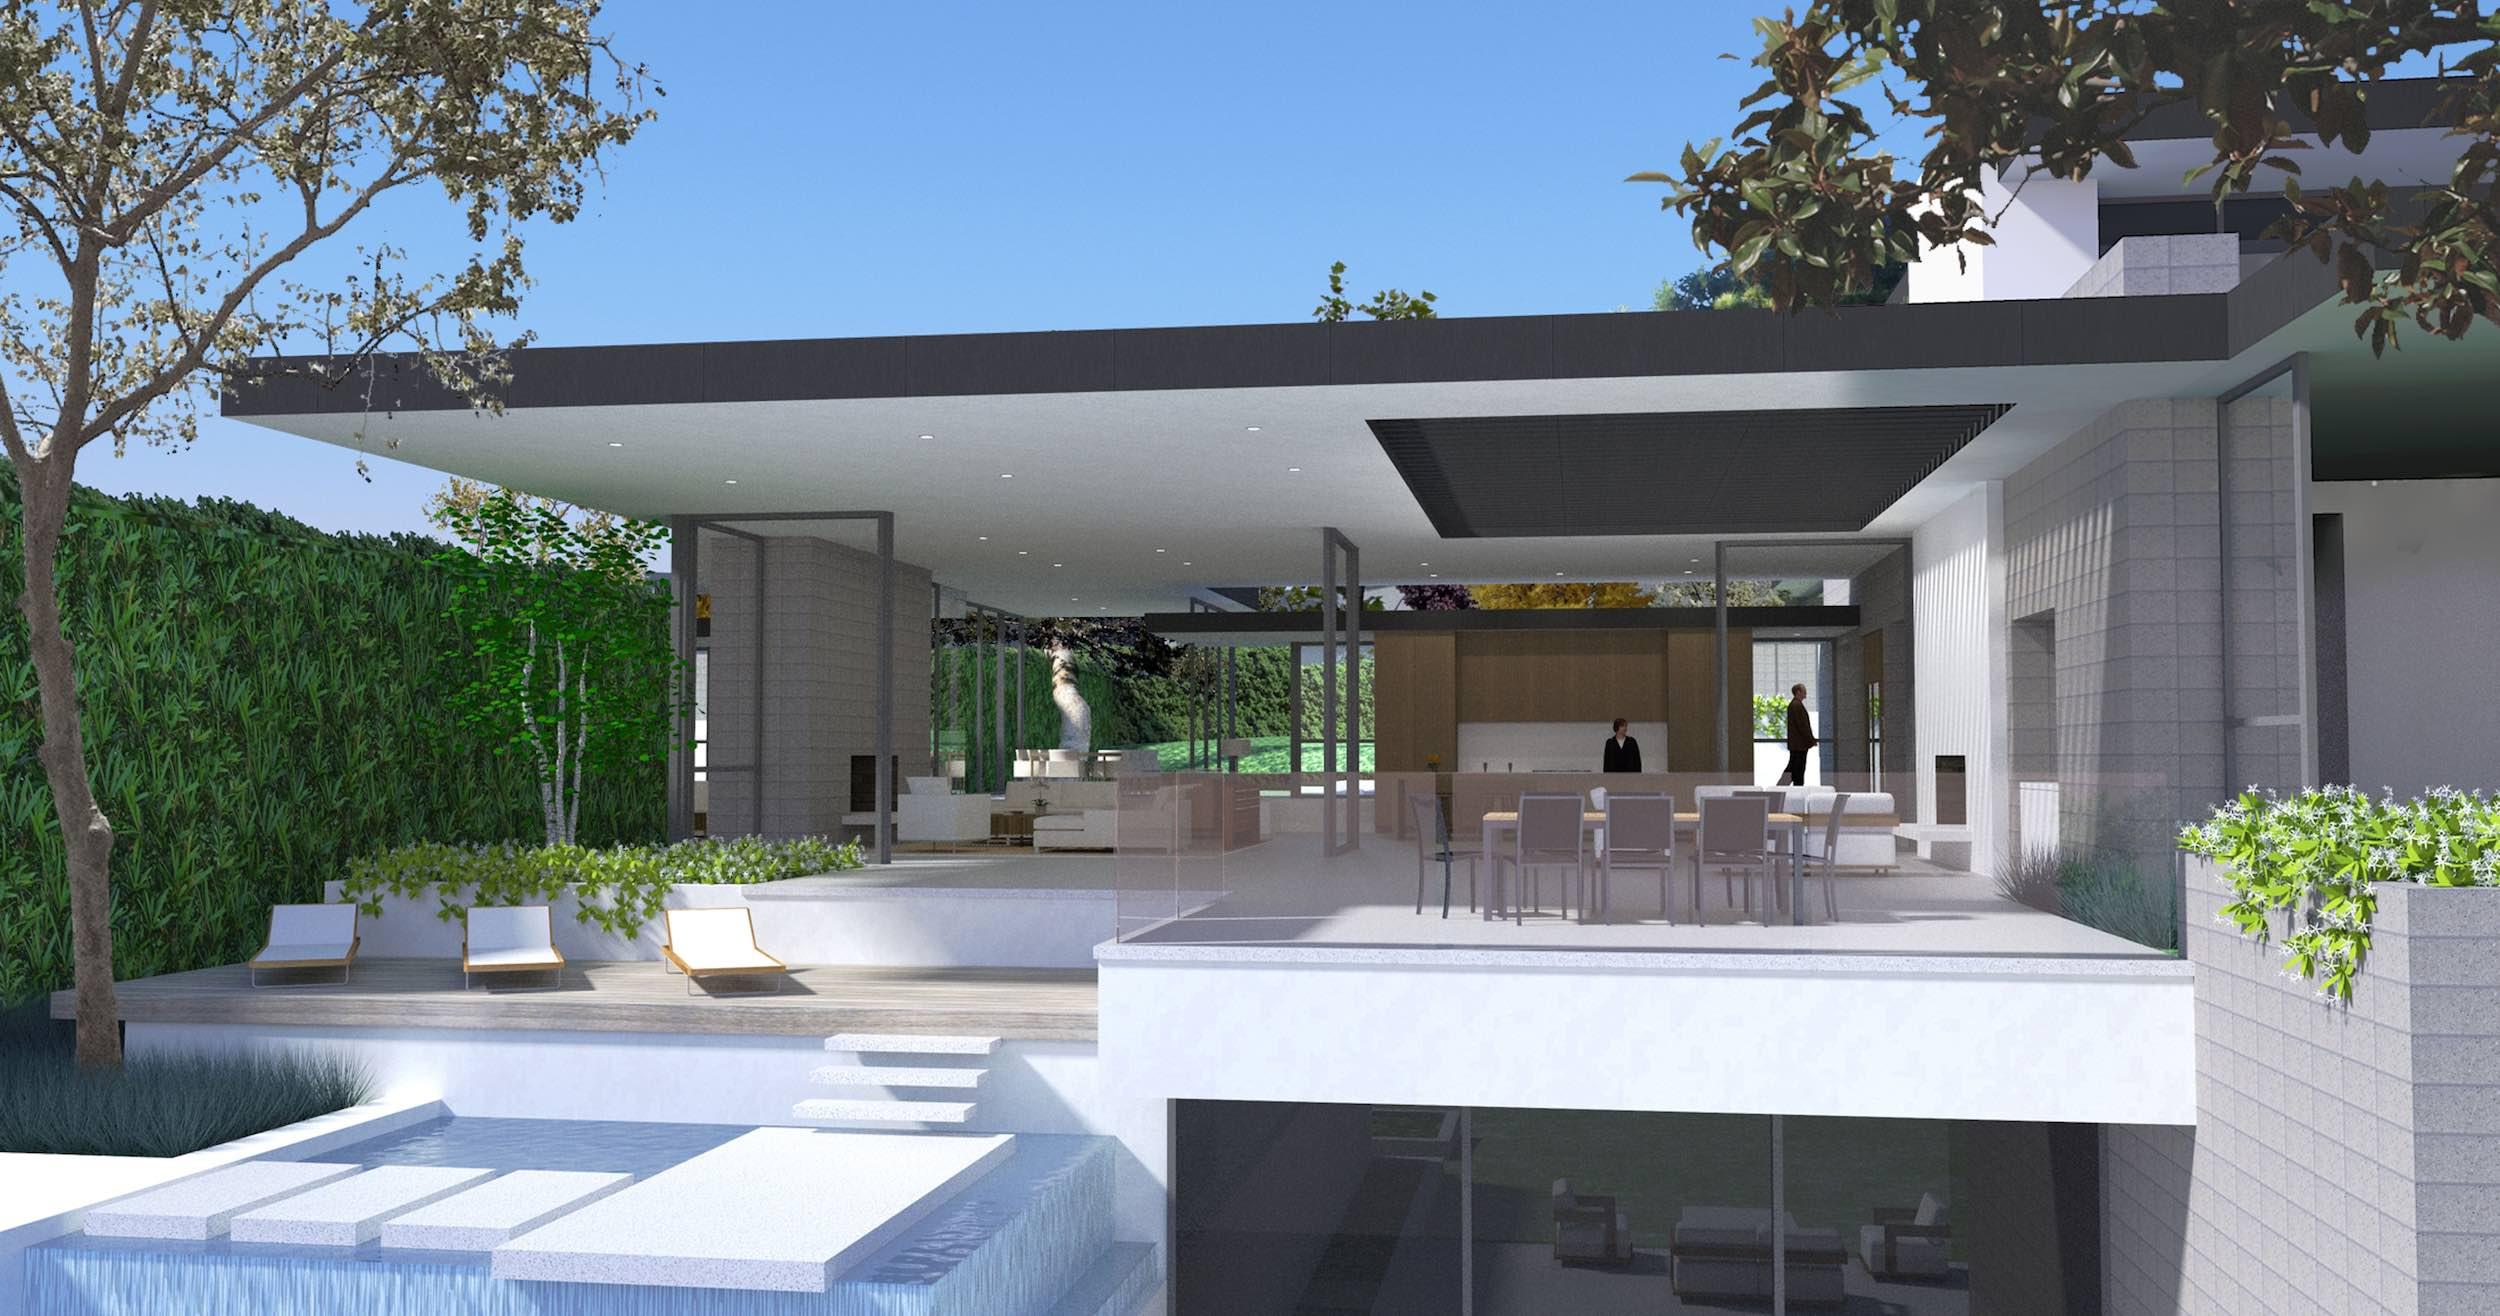 House Design Architects on architect design home, architect design kitchen, architect design furniture, architect design park, architect design office,